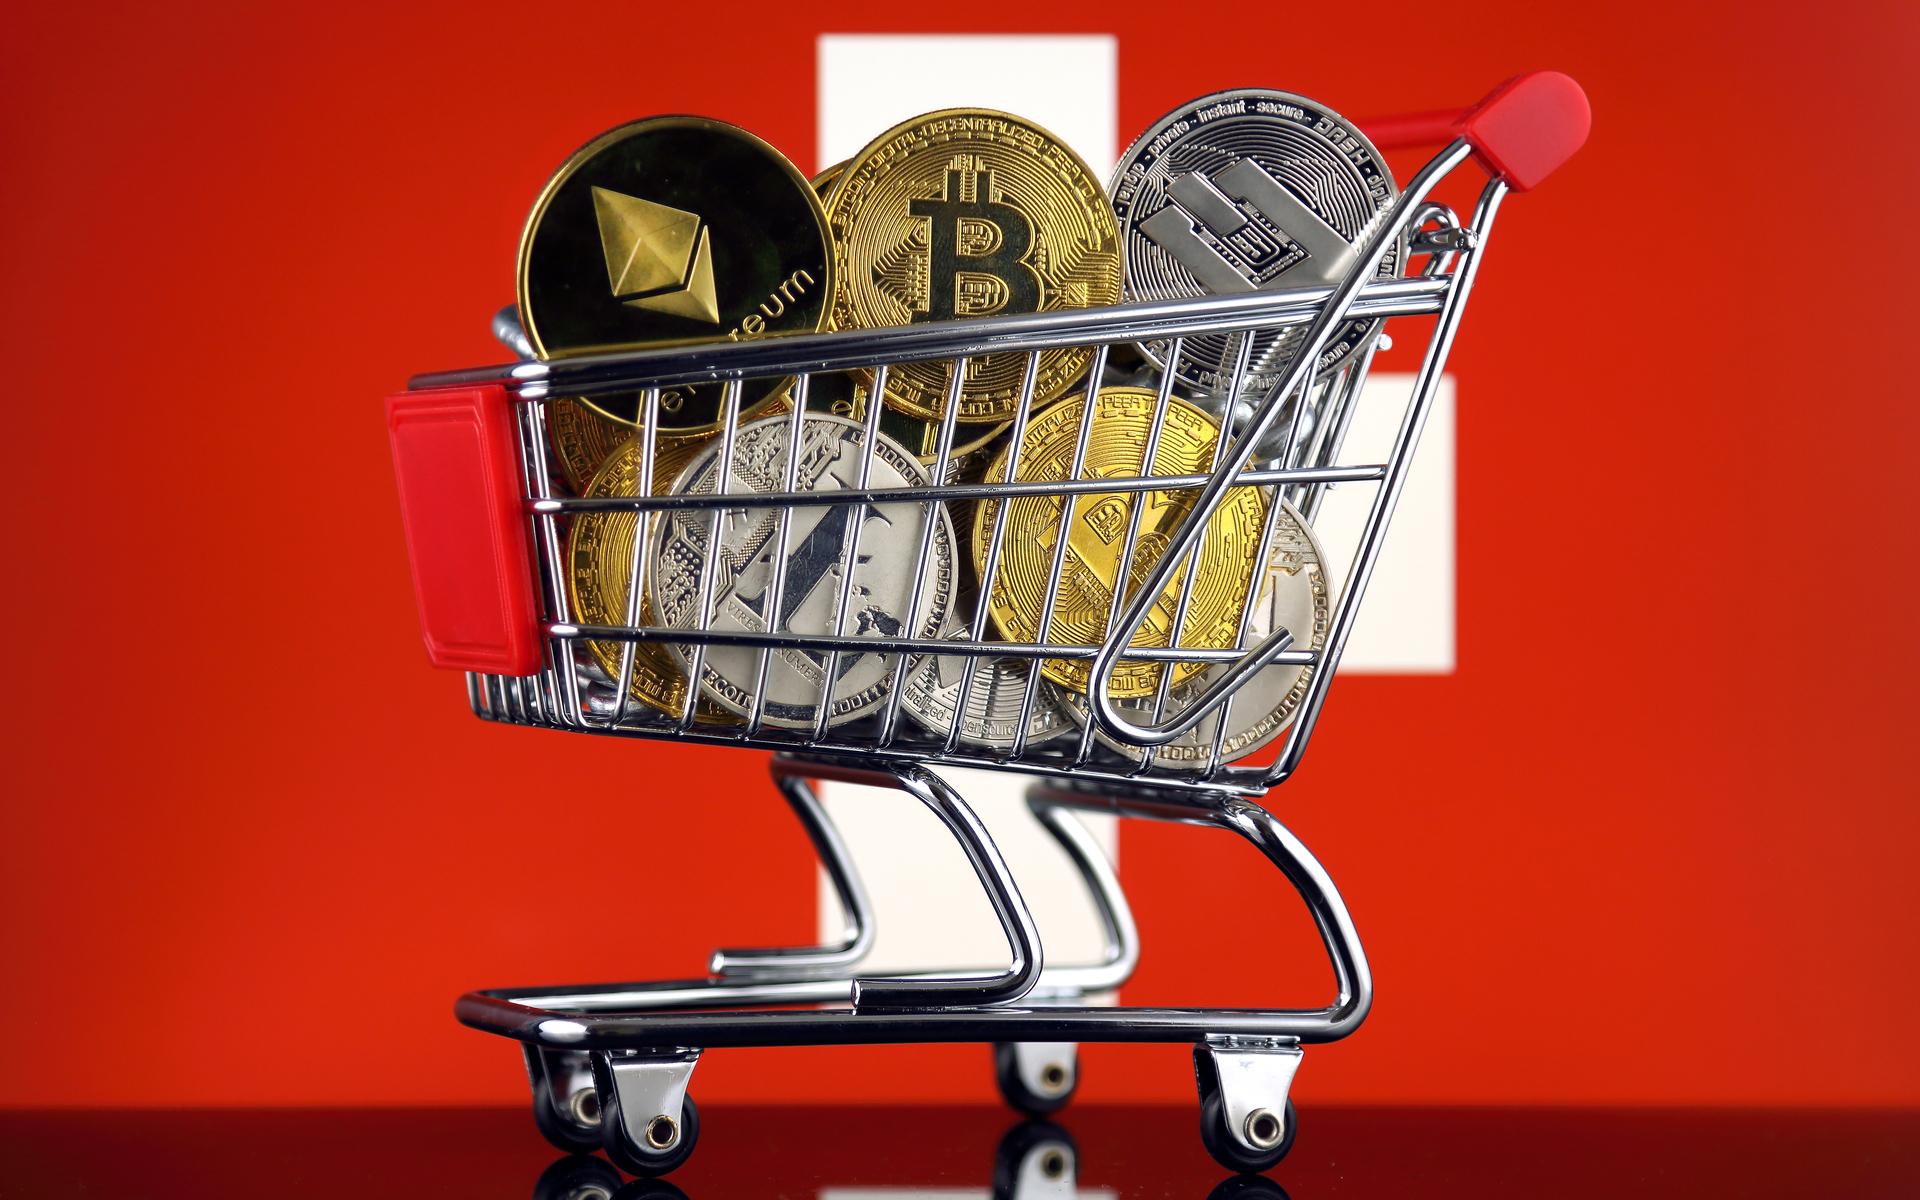 Switzerland's Biggest Online Retailer Starts Accepting Bitcoin